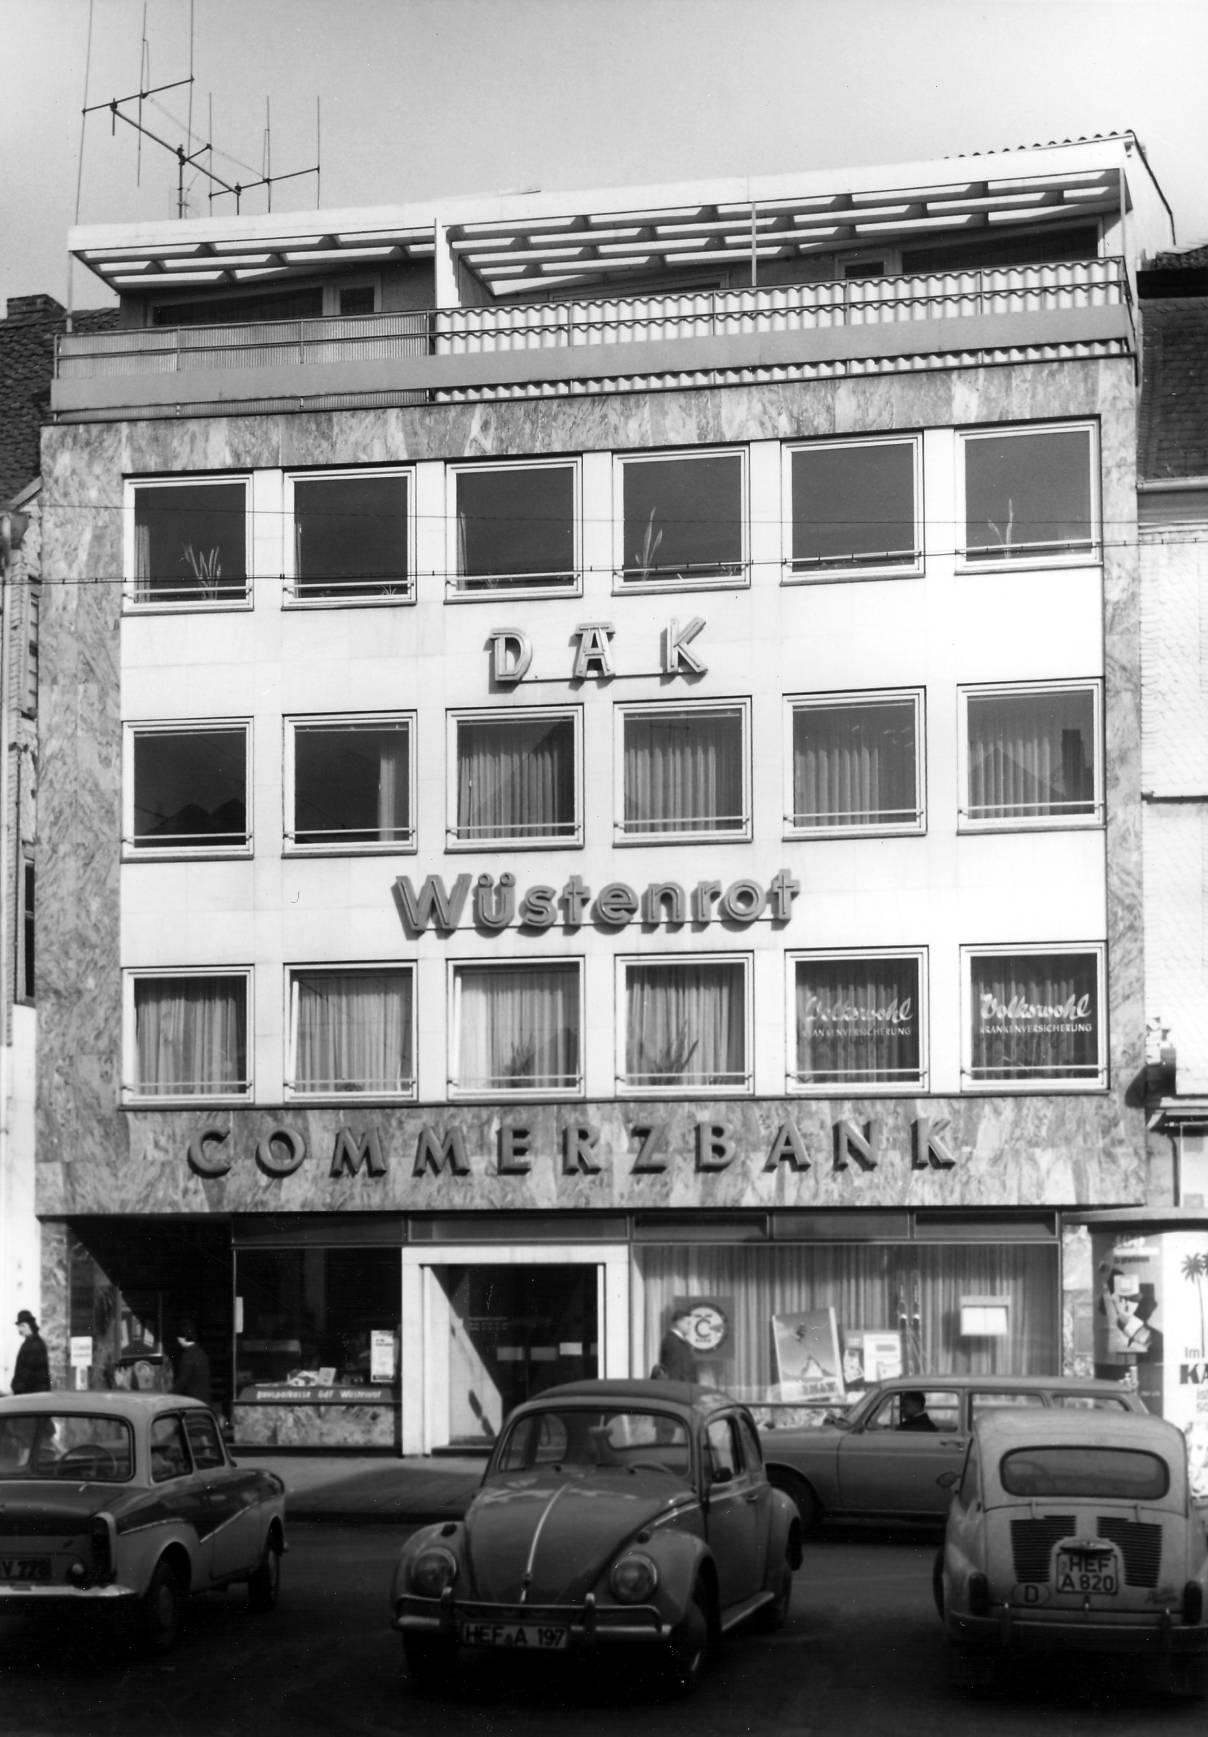 Commerzbank Bad Hersfeld